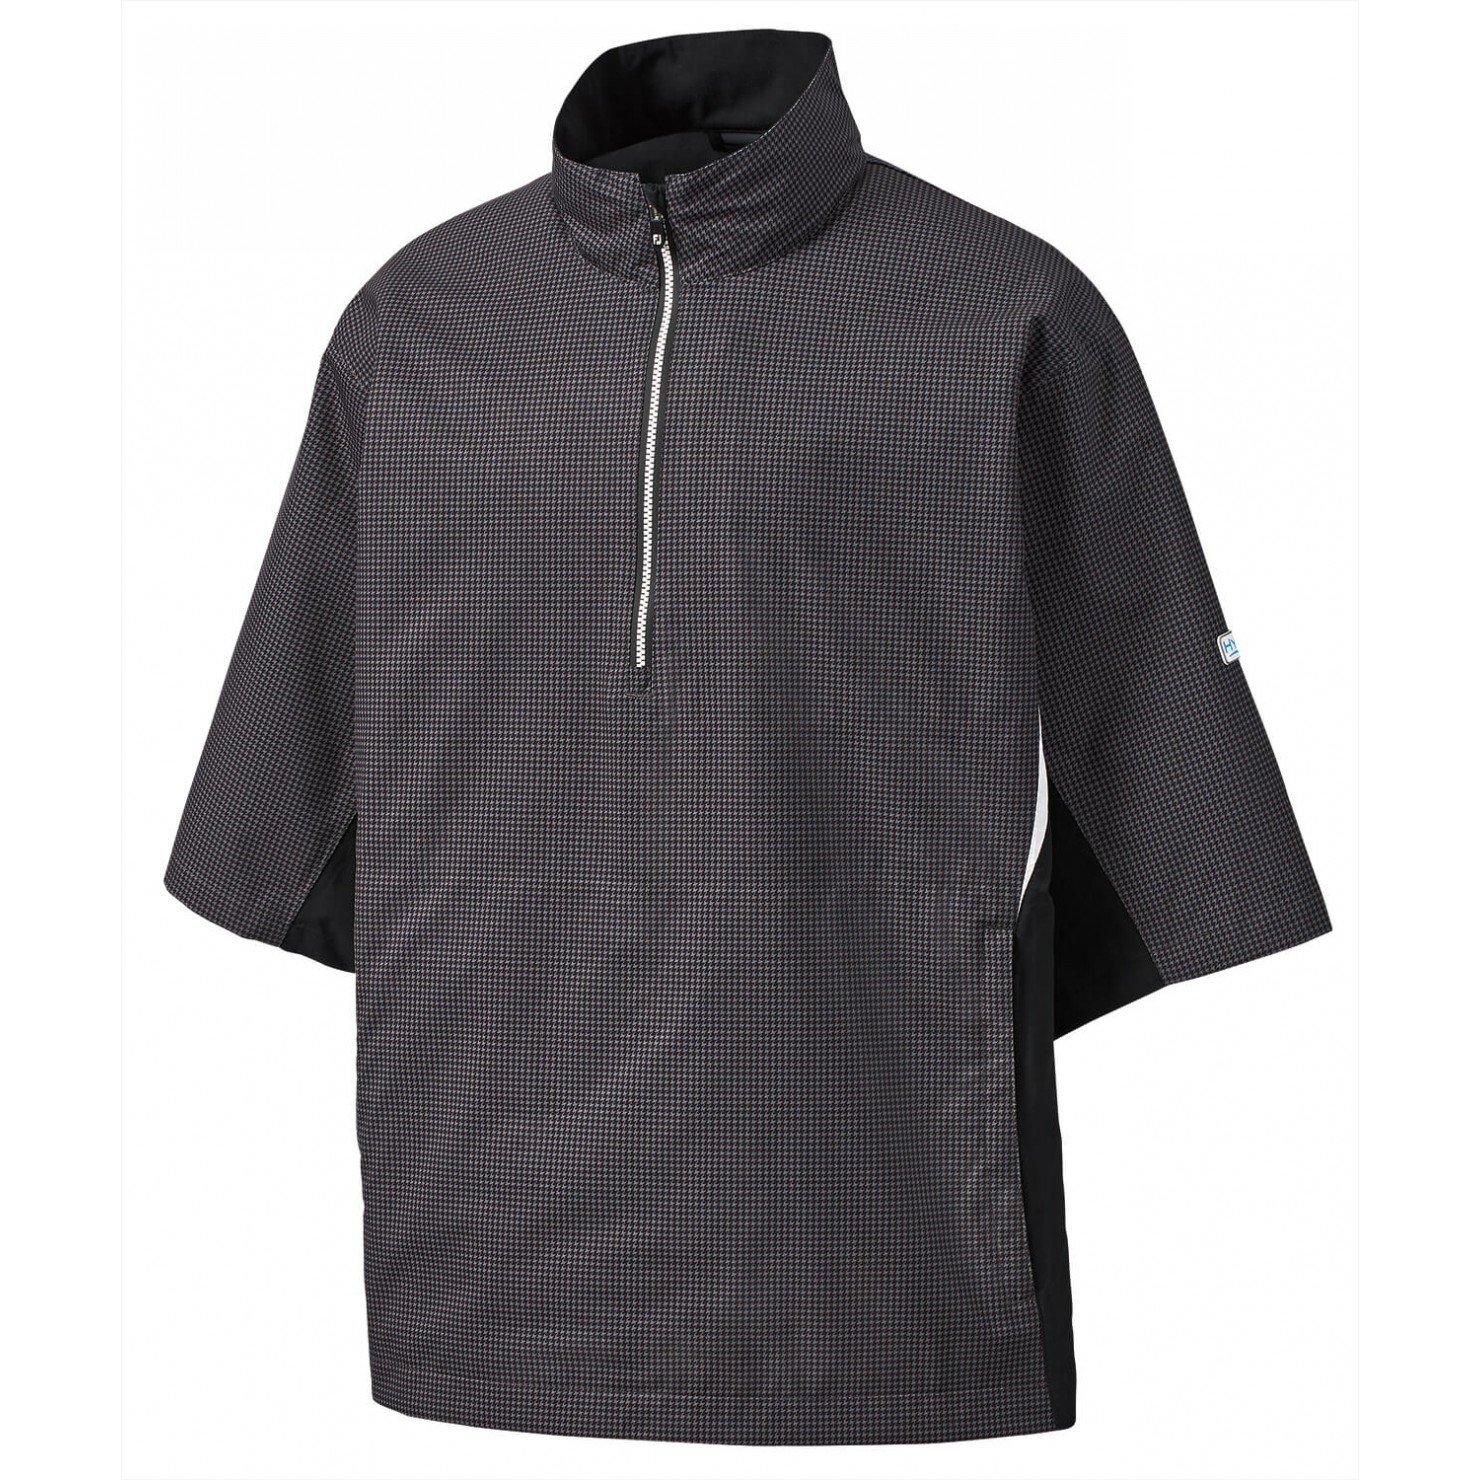 FootJoy Hydrolite Short Sleeve Golf Rain Shirt